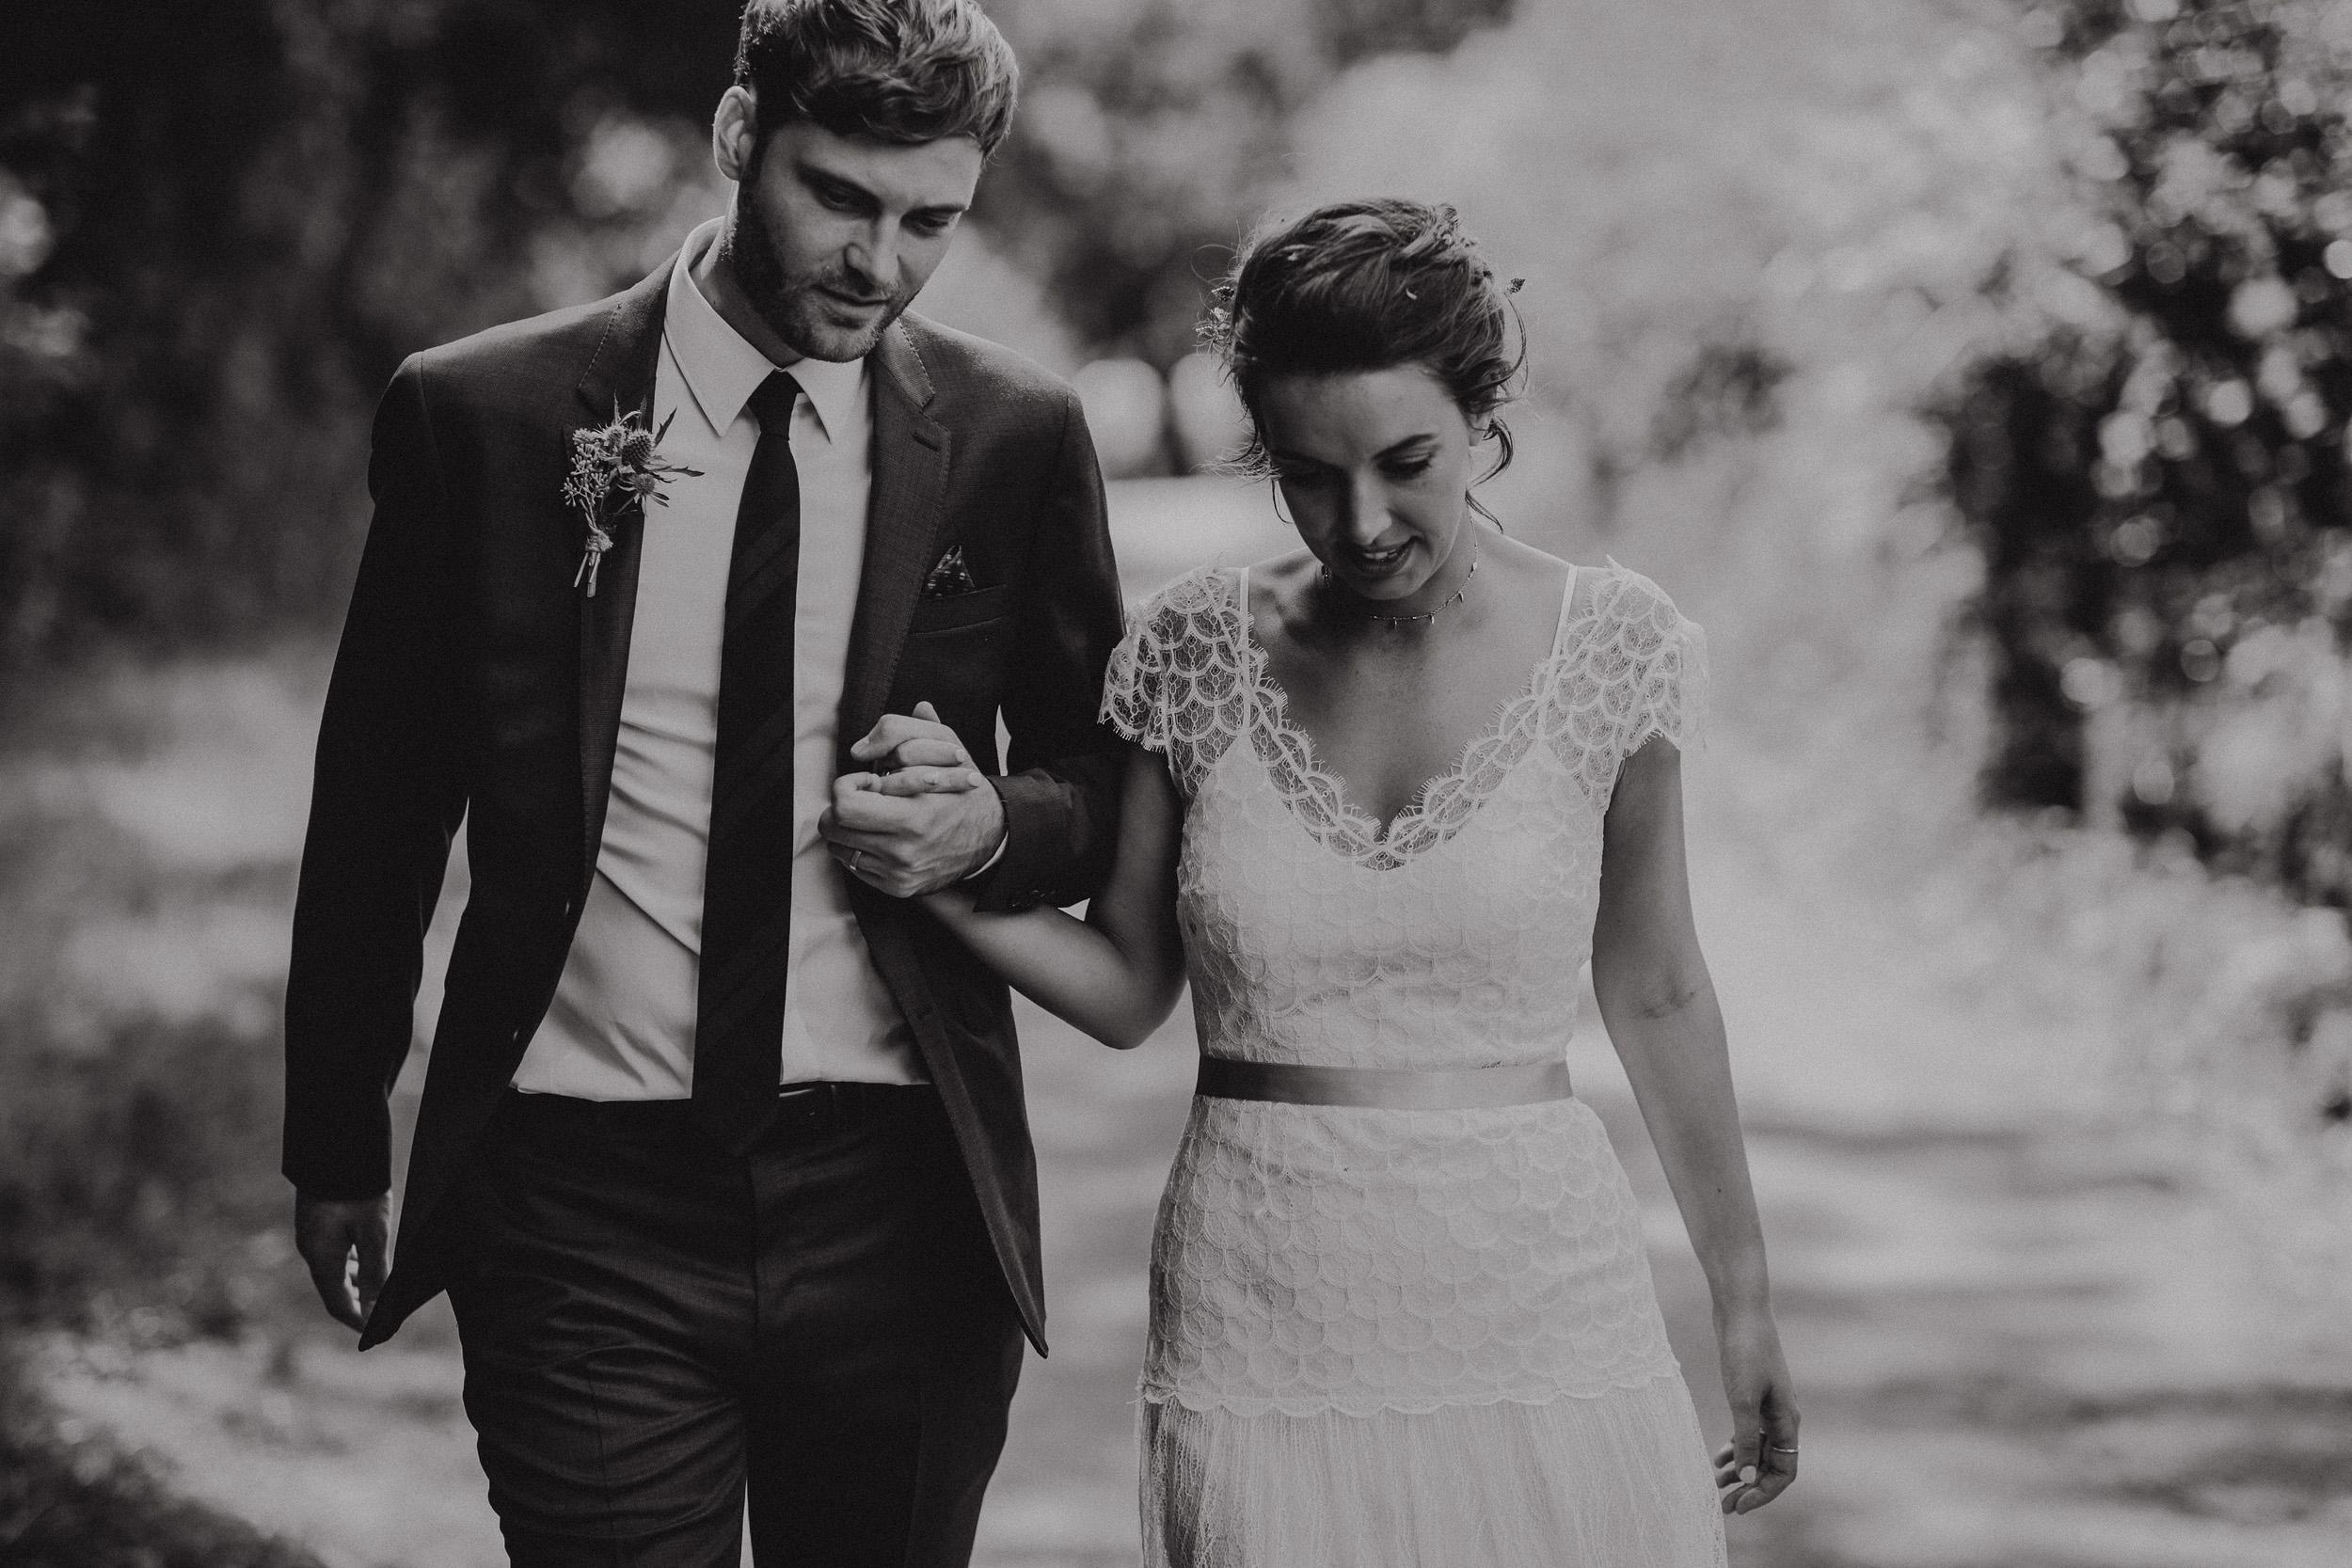 Martha-Laid-Back-Garden-Wedding-Lace-Wedding-Dress-Bohemian-Kate-Beaumont-33.jpg